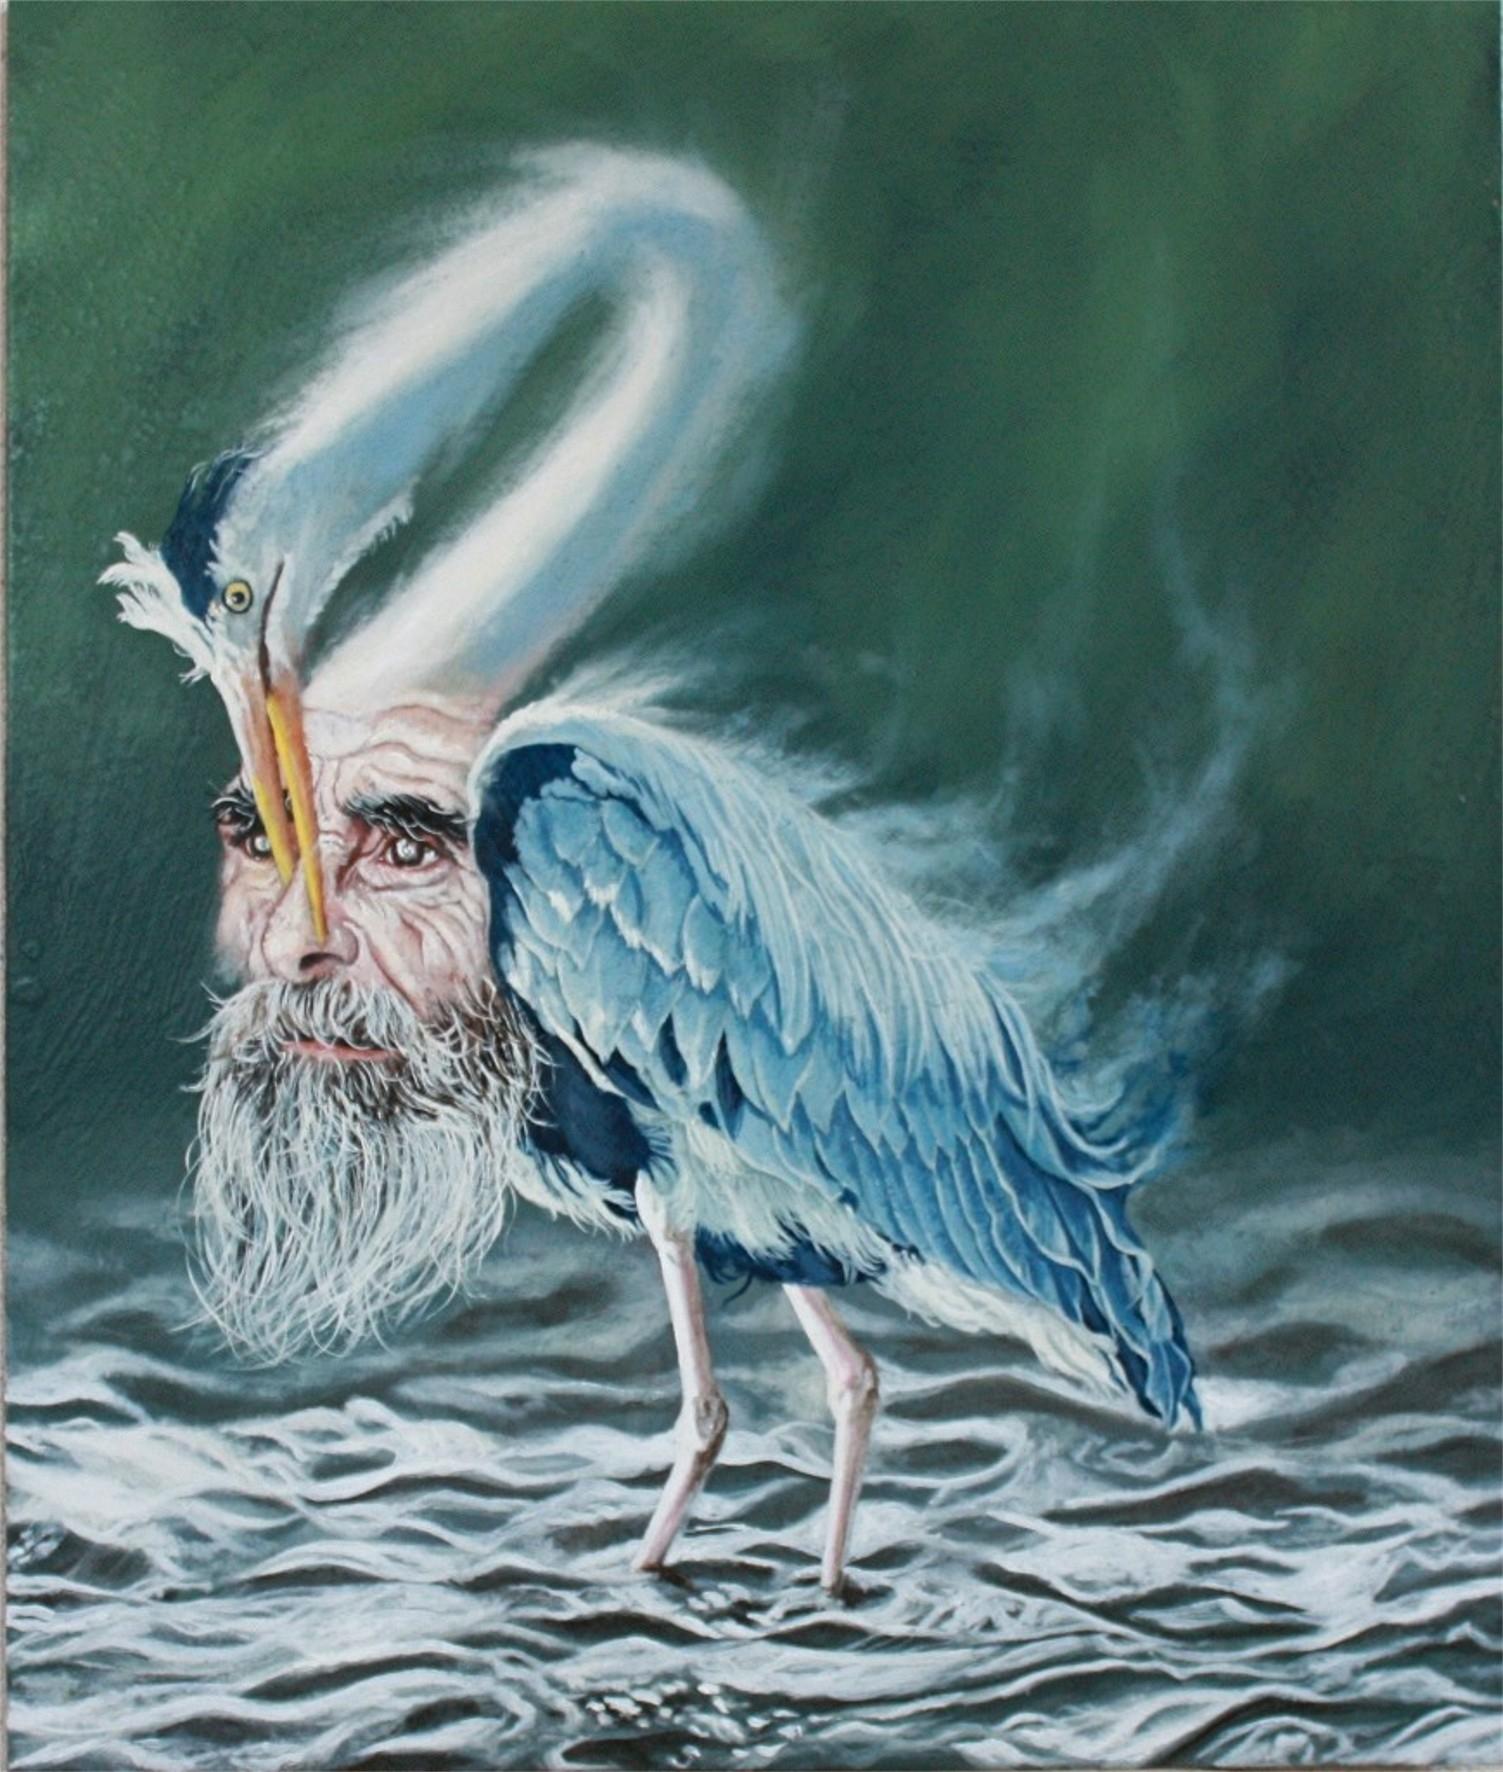 Alessandro Bulgarini, The bird of self knowledge, olio su tavola, cm 50 x 60, 2013